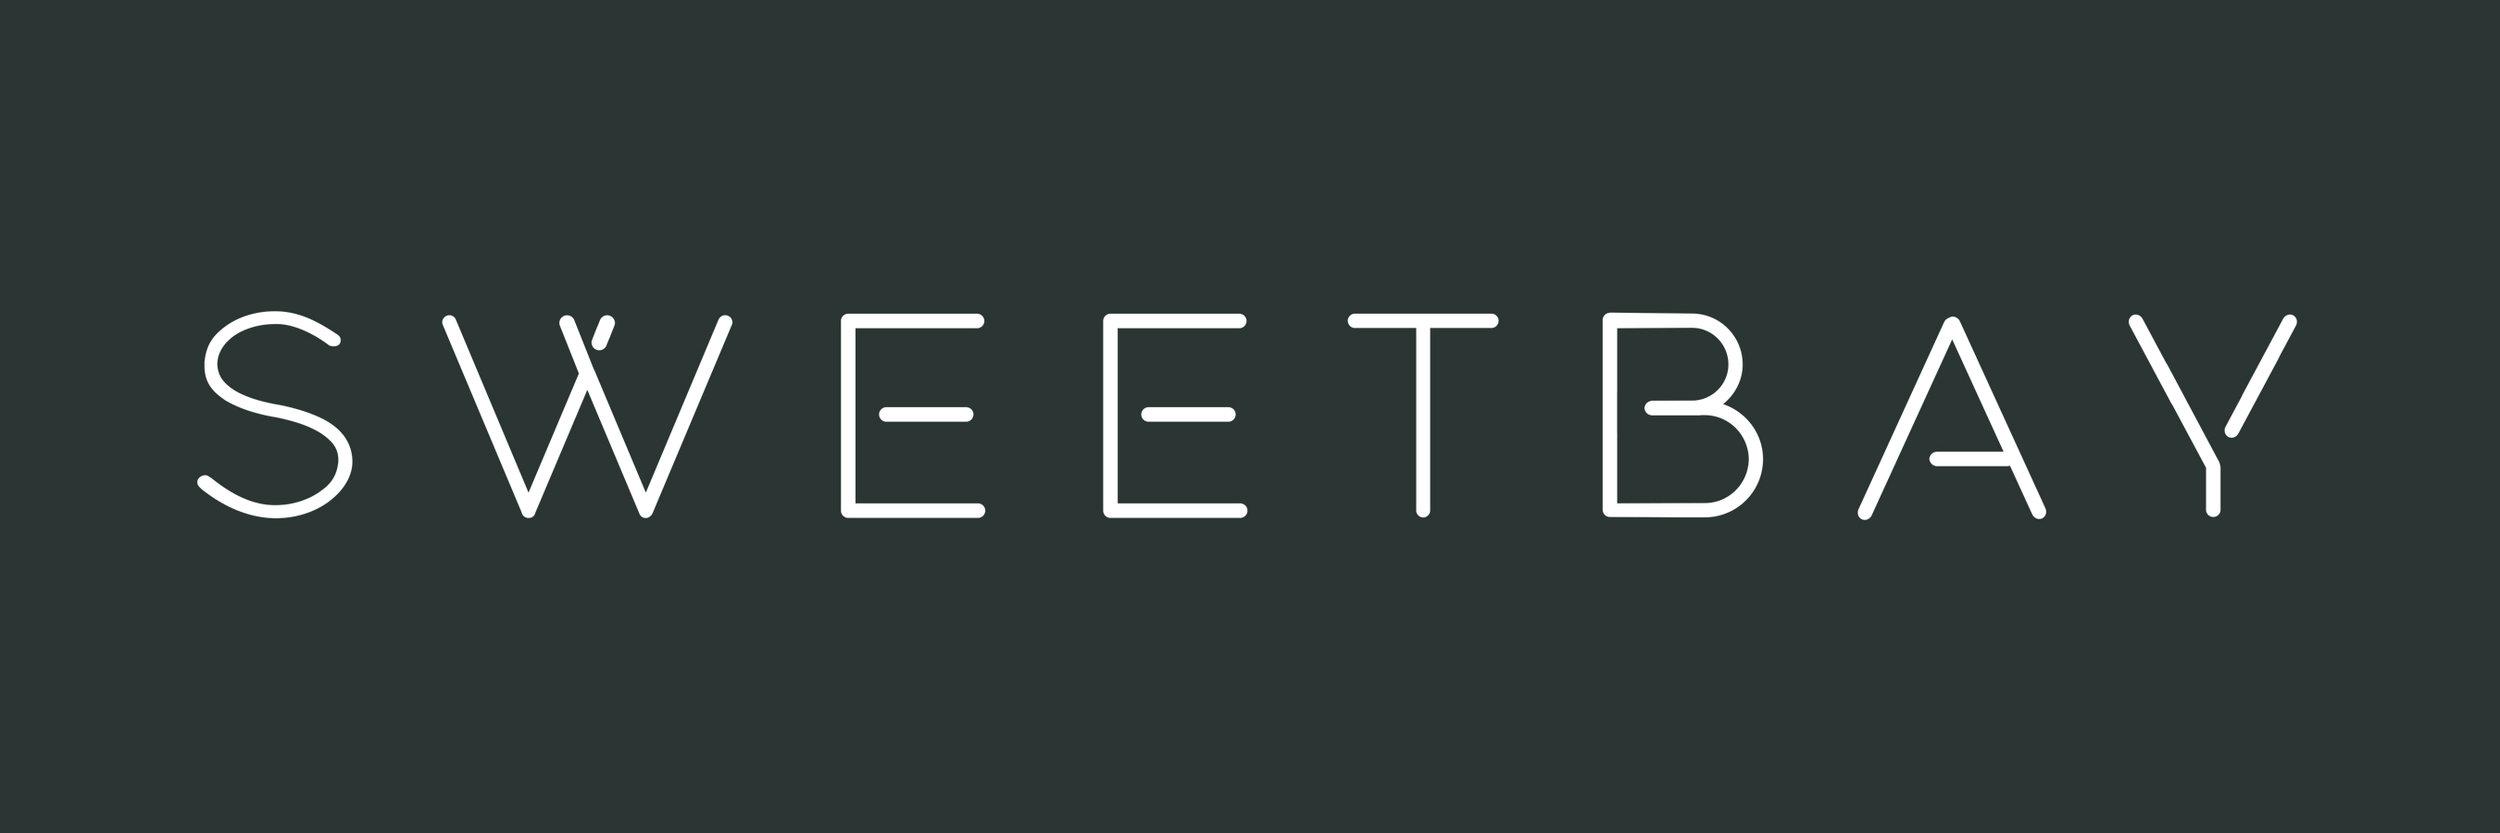 Sweetbay_logo_white.jpg